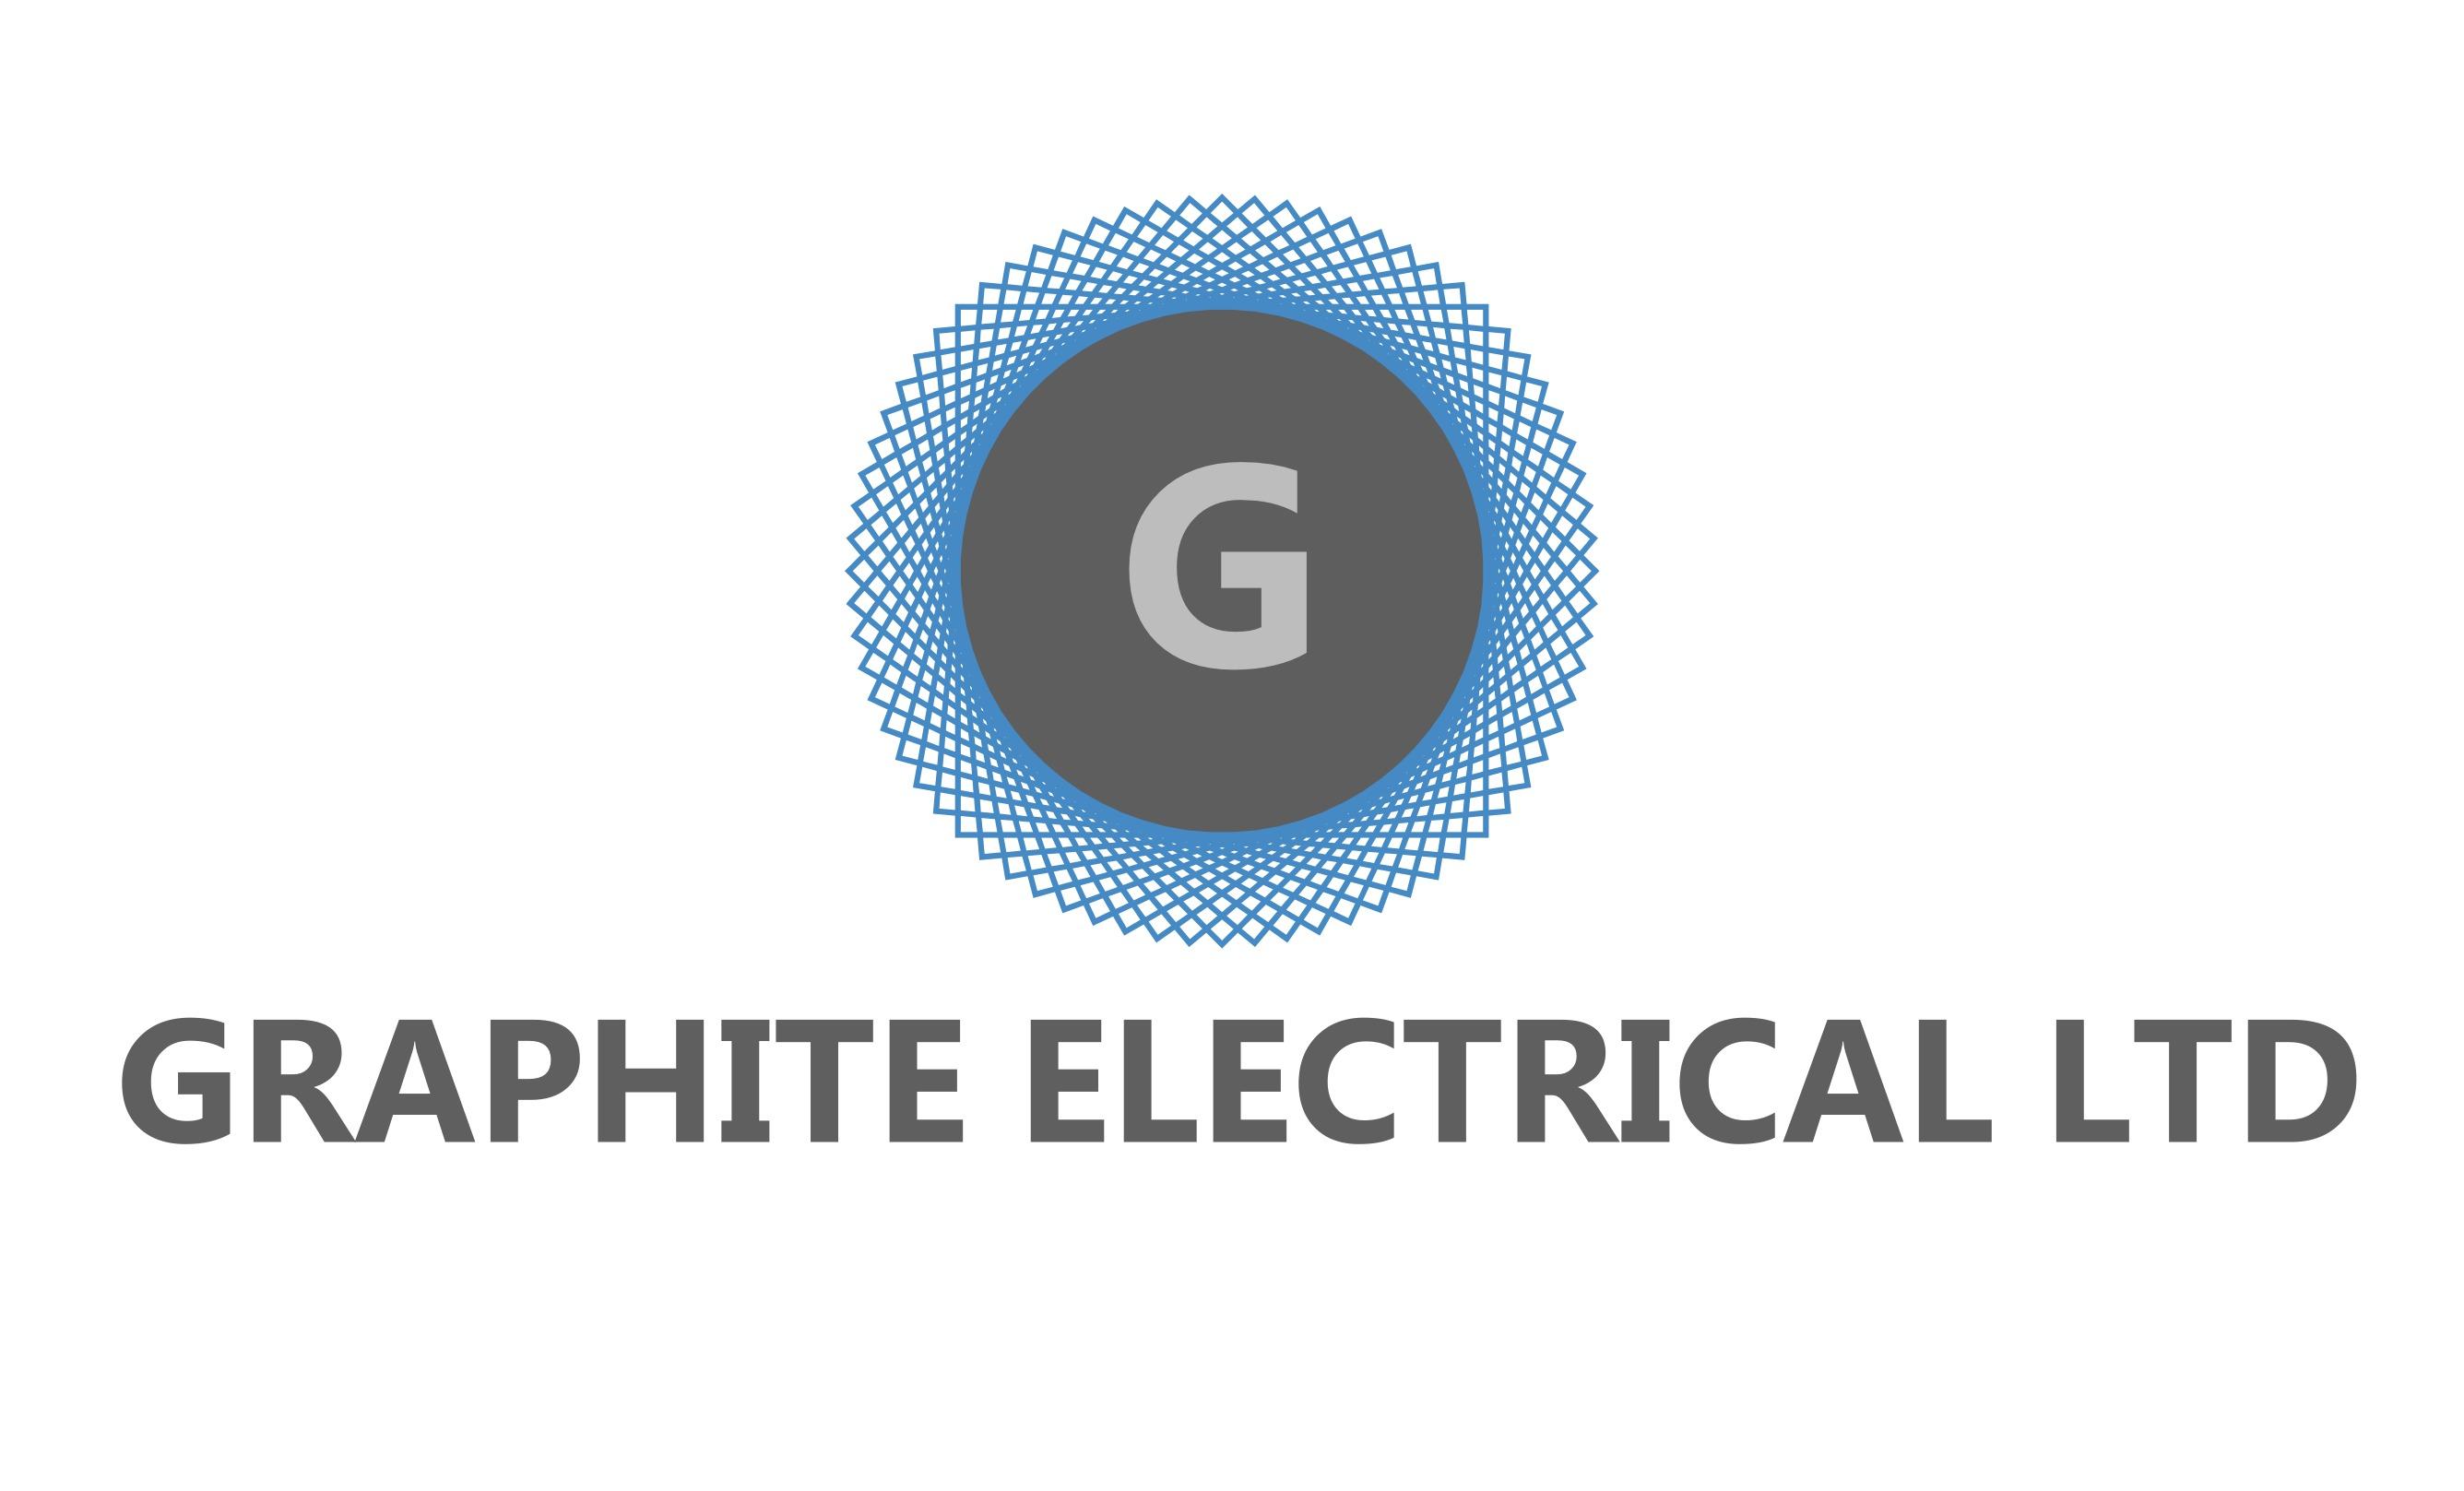 Graphite Electrical Ltd - Swansea, West Glamorgan SA1 8DX - 01792 699300 | ShowMeLocal.com